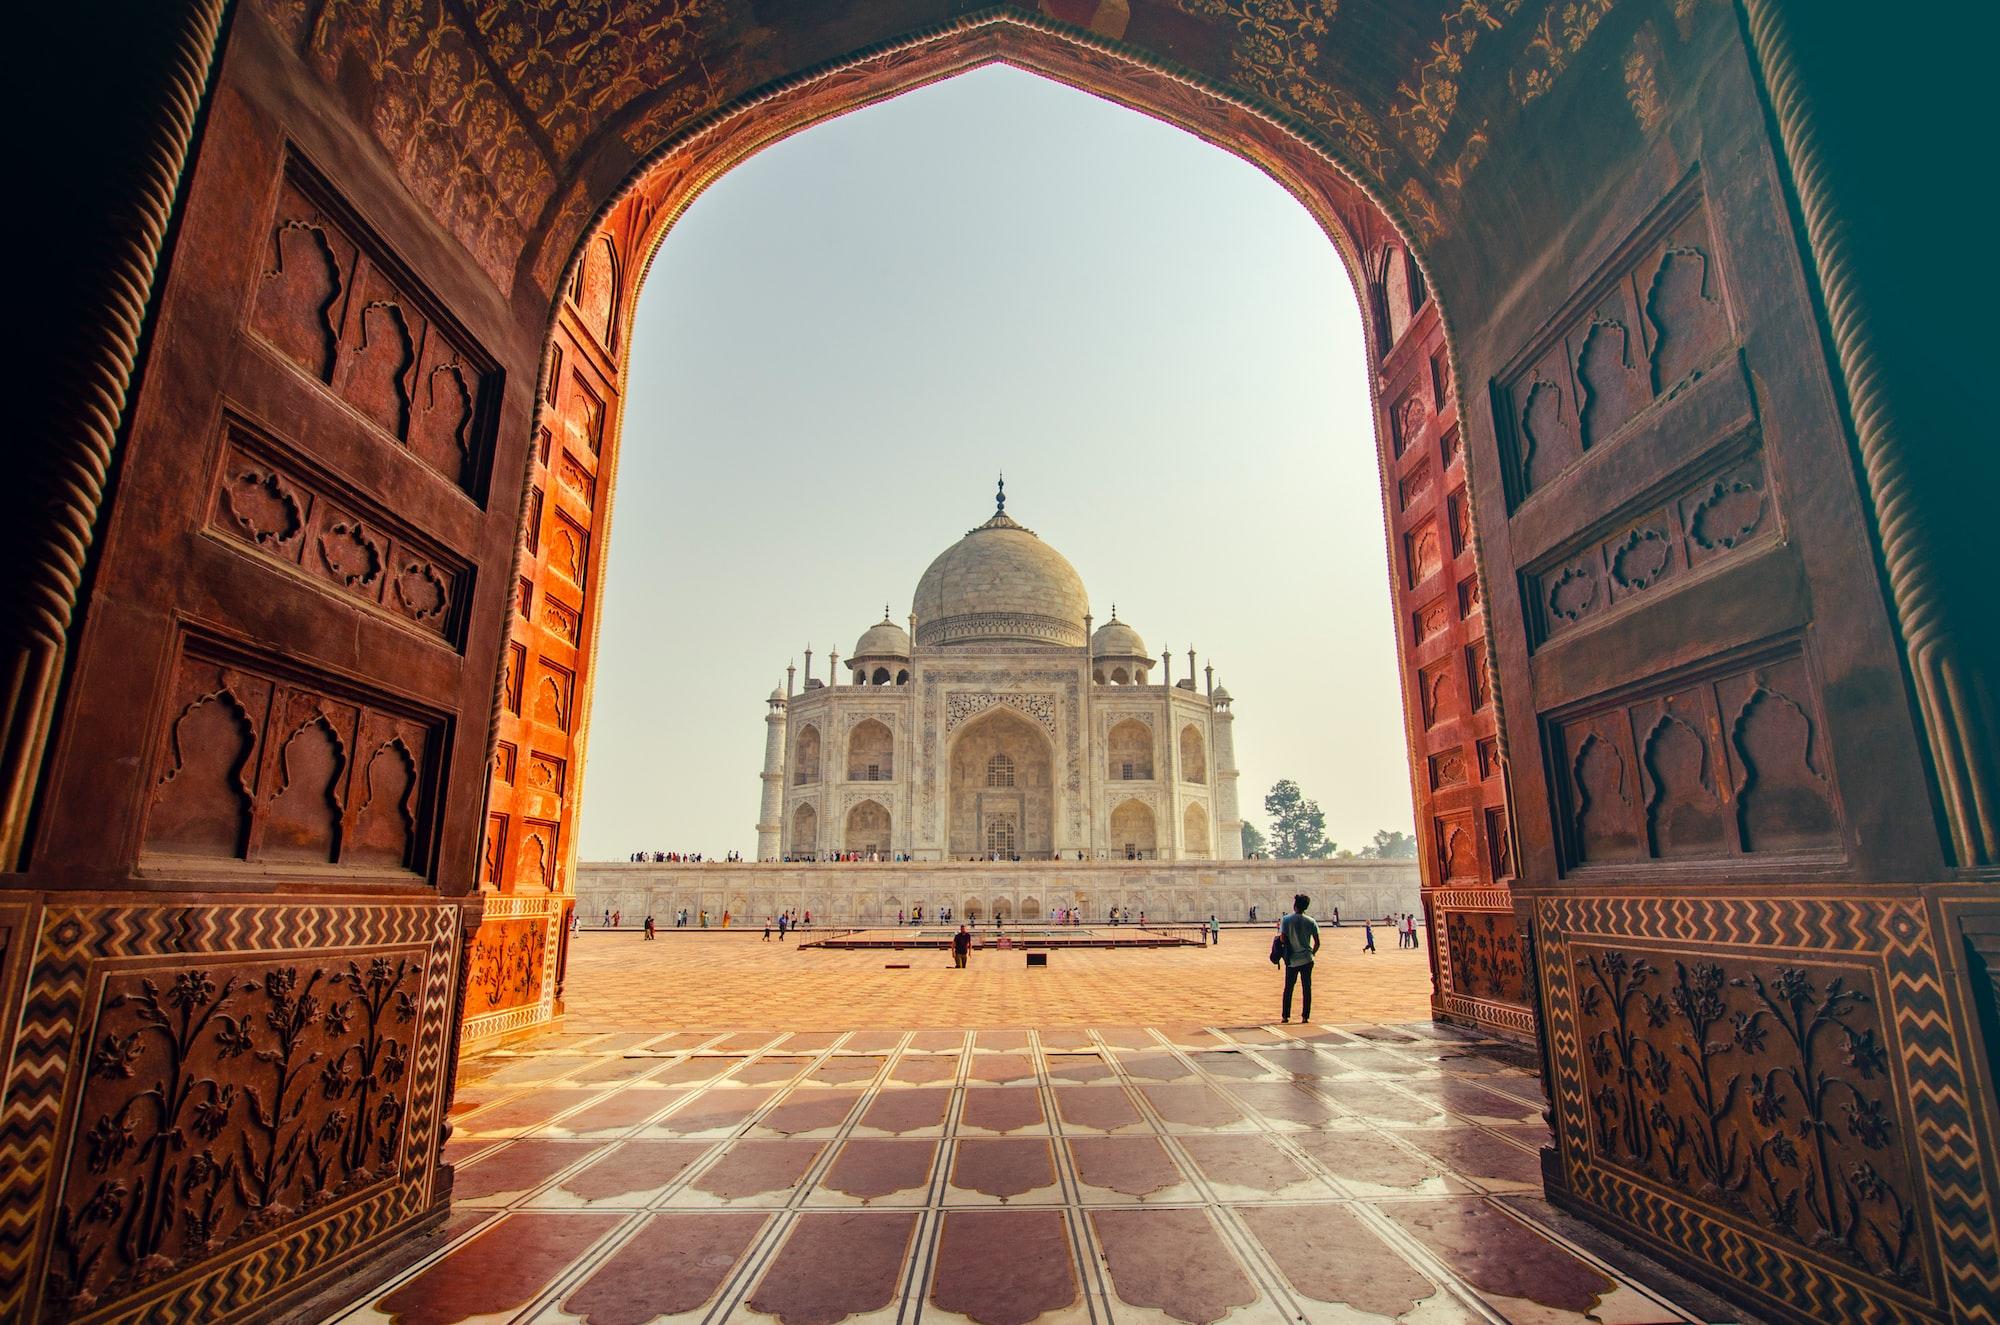 विदेशी पर्यटकों- आओ भारत देस...  लेकिन 'पारस्परिक उपचार' लागू होगा!